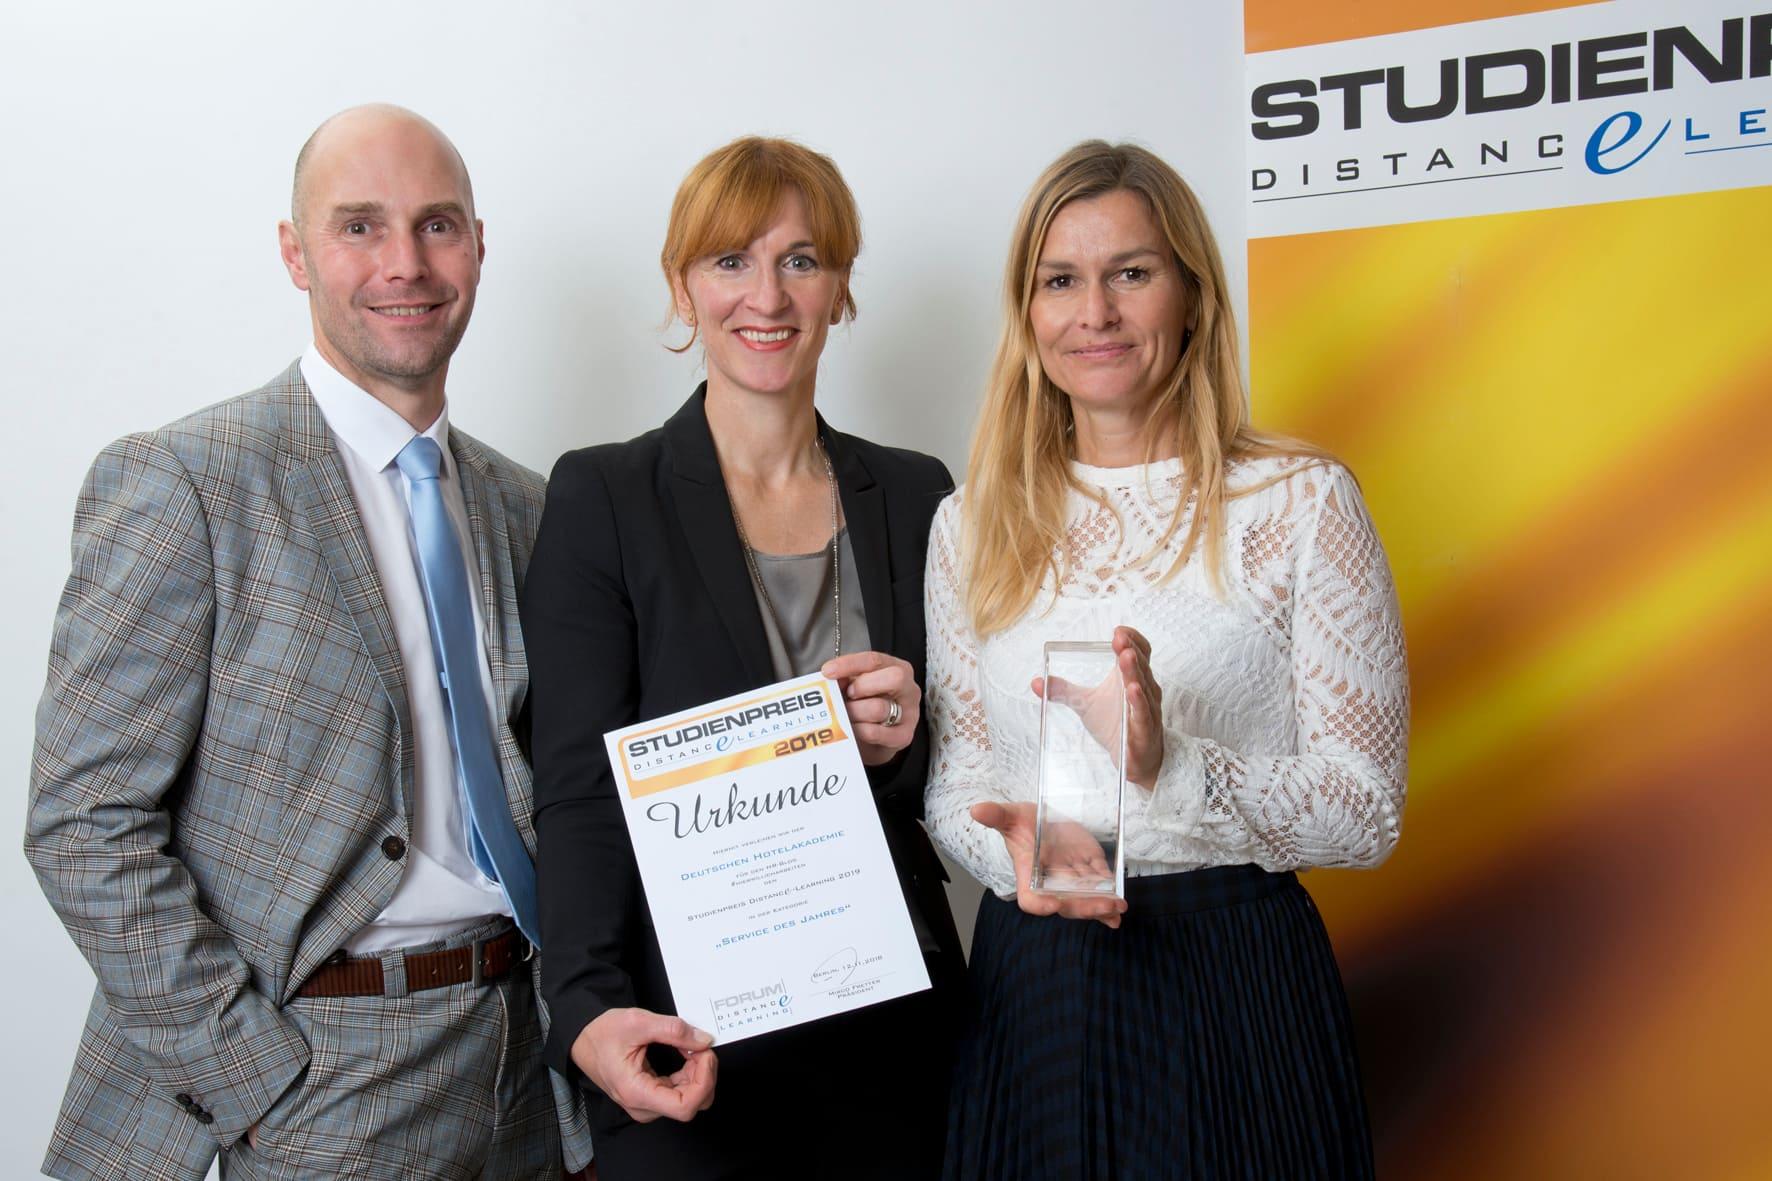 Studienpreis Award 2019